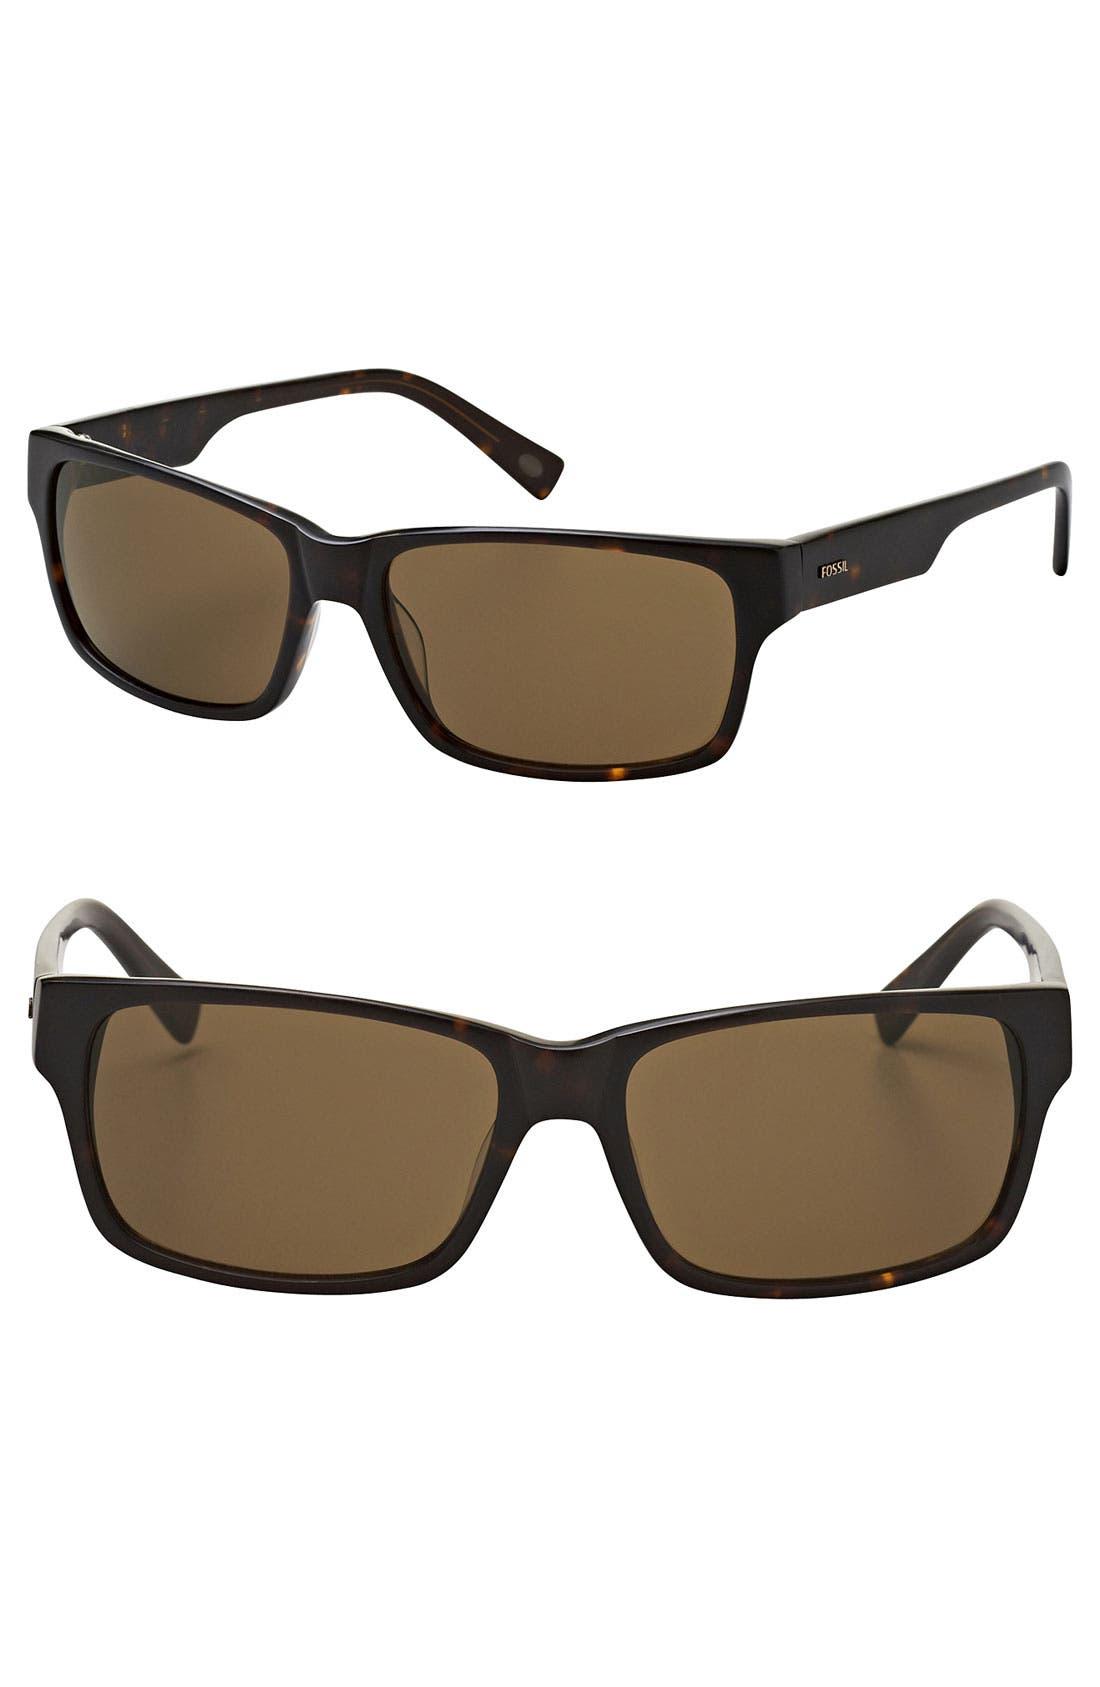 Main Image - Fossil 'Jackson' 60mm Polarized Sunglasses